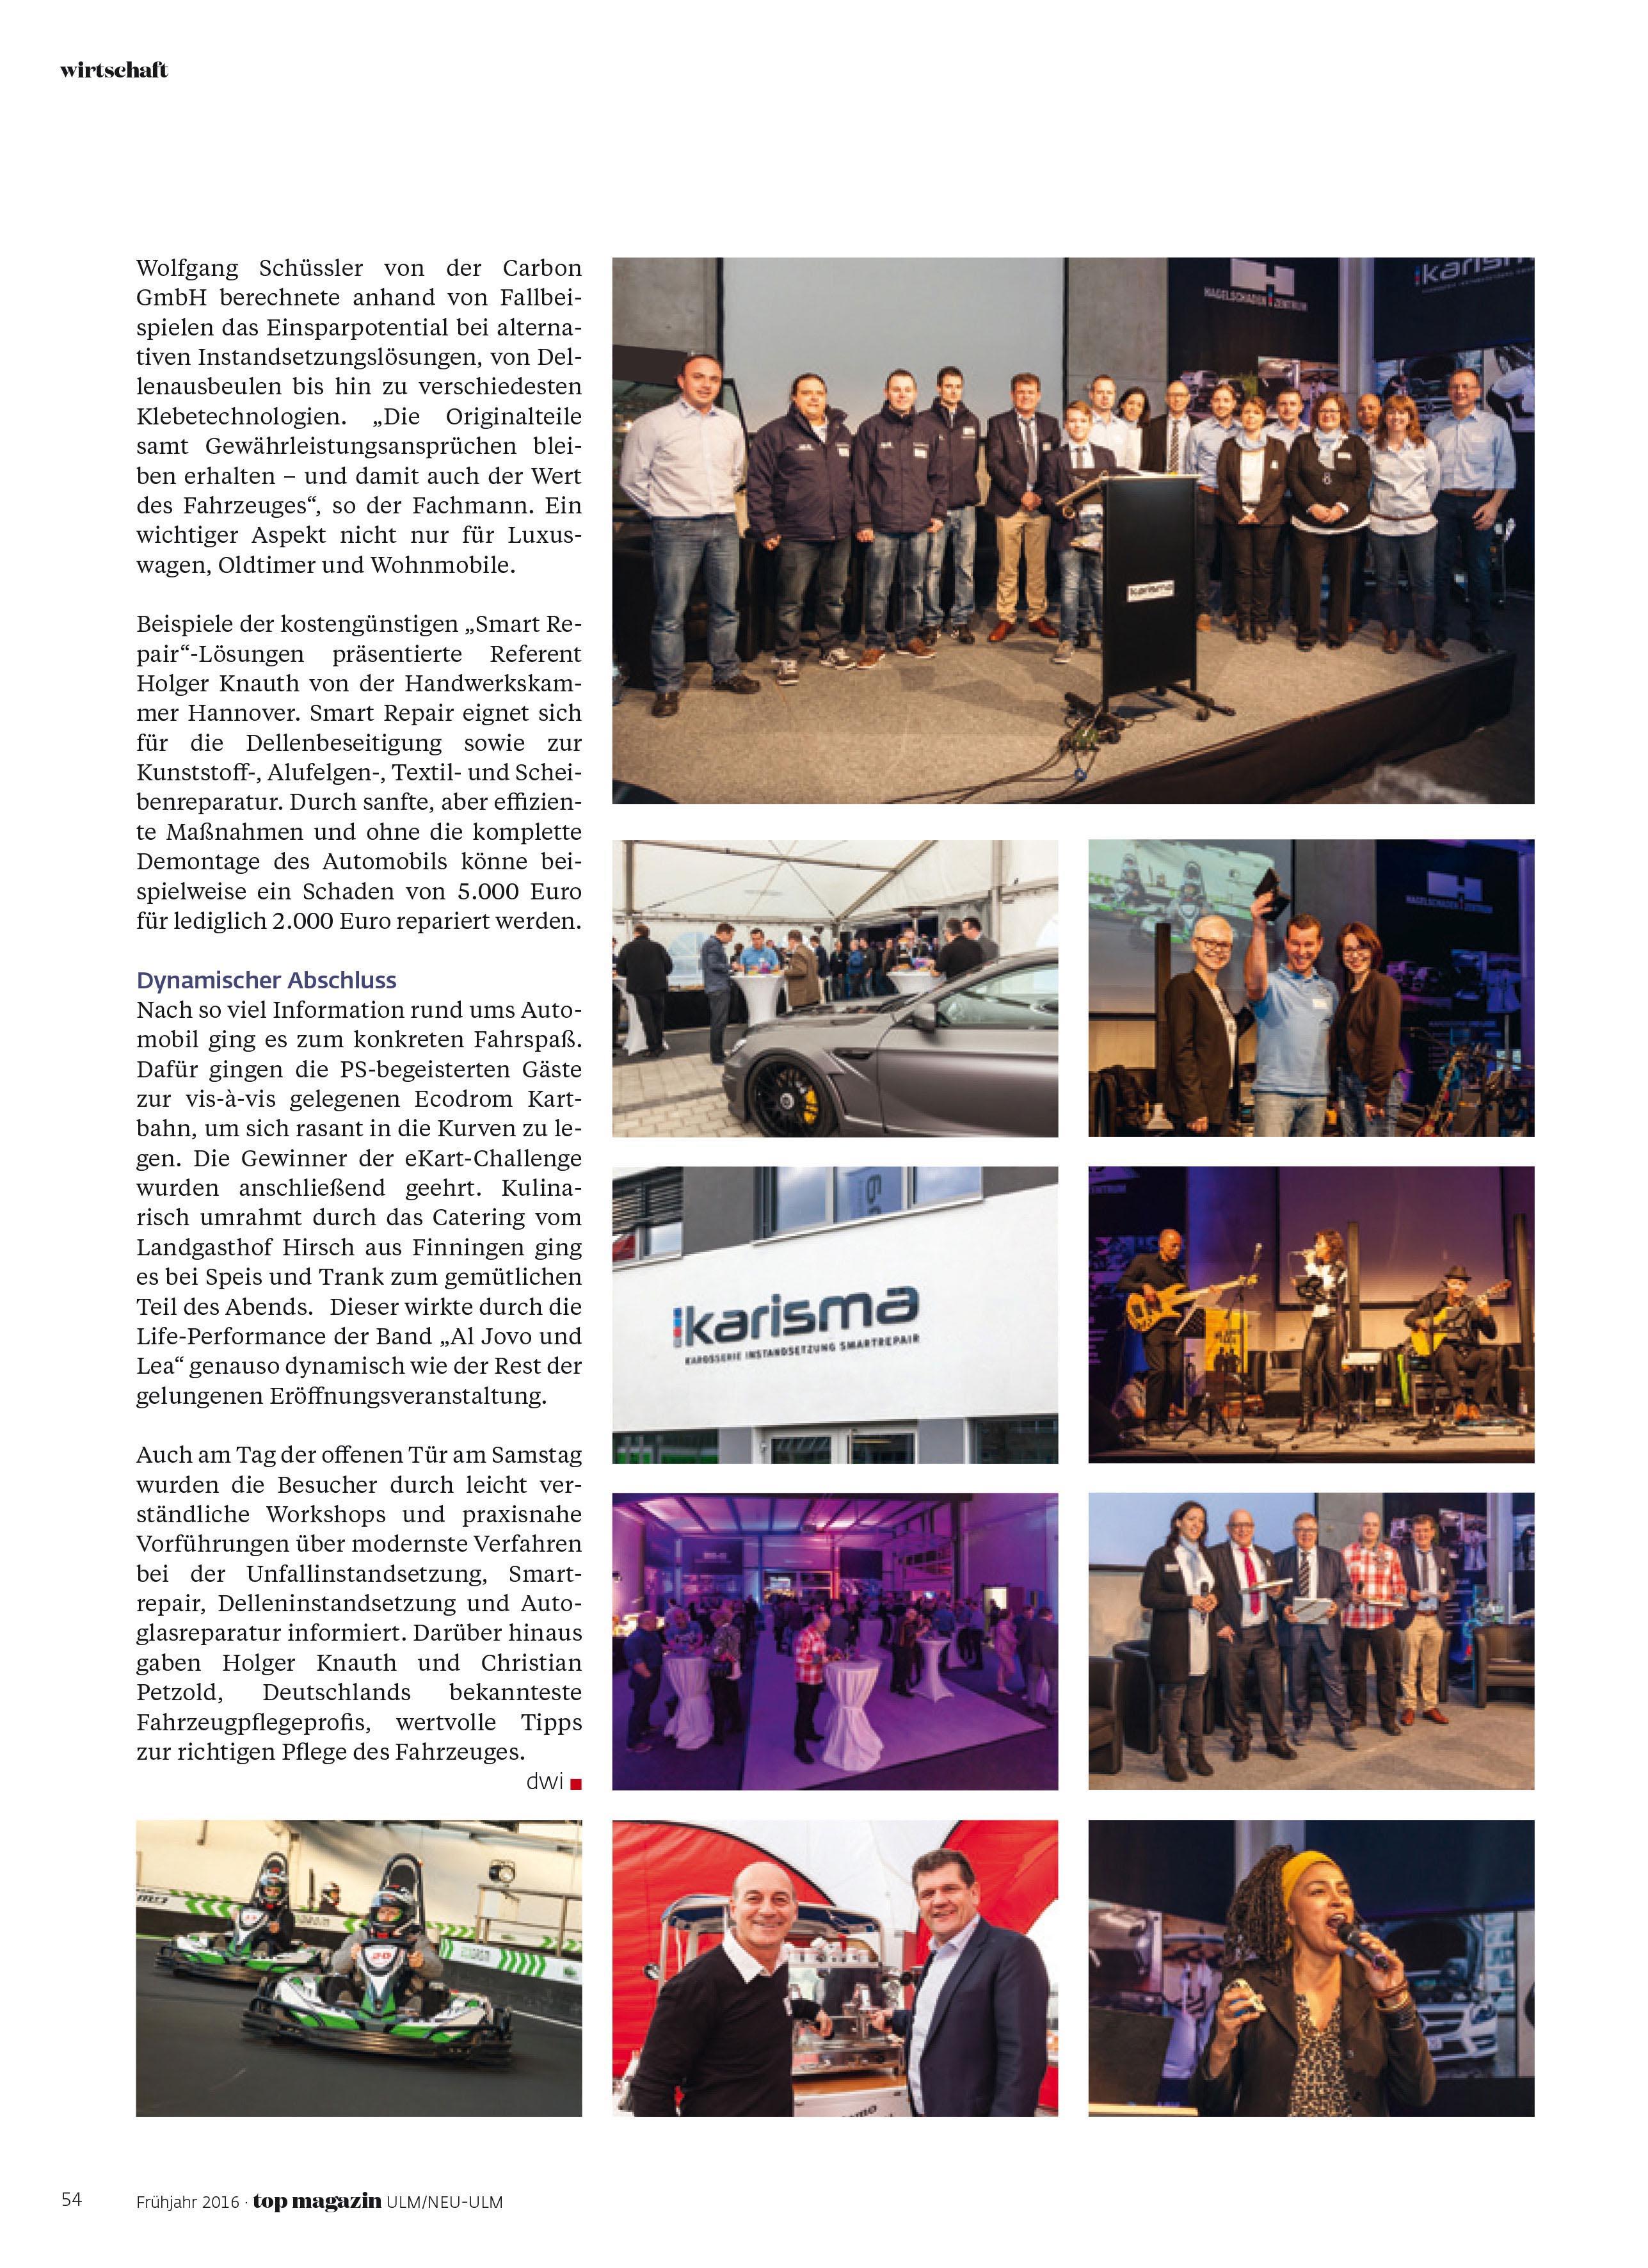 knu-presse-top-magazin-ulm-neueroeffnung-karisma-2-oks